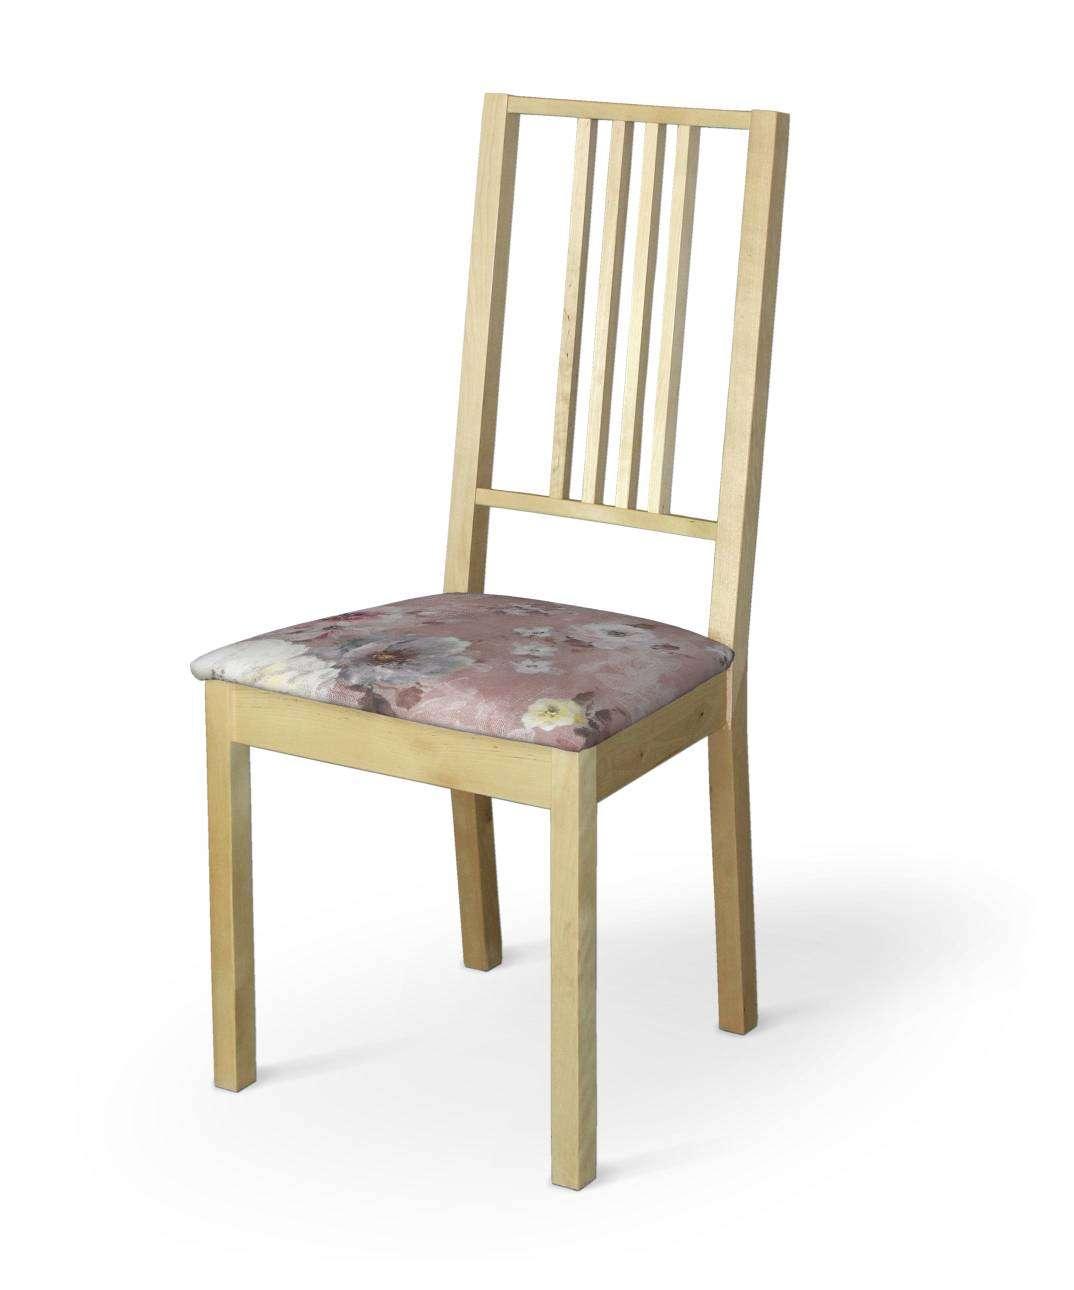 Börje Sitzbezug Stuhlbezug Börje von der Kollektion Monet, Stoff: 137-83